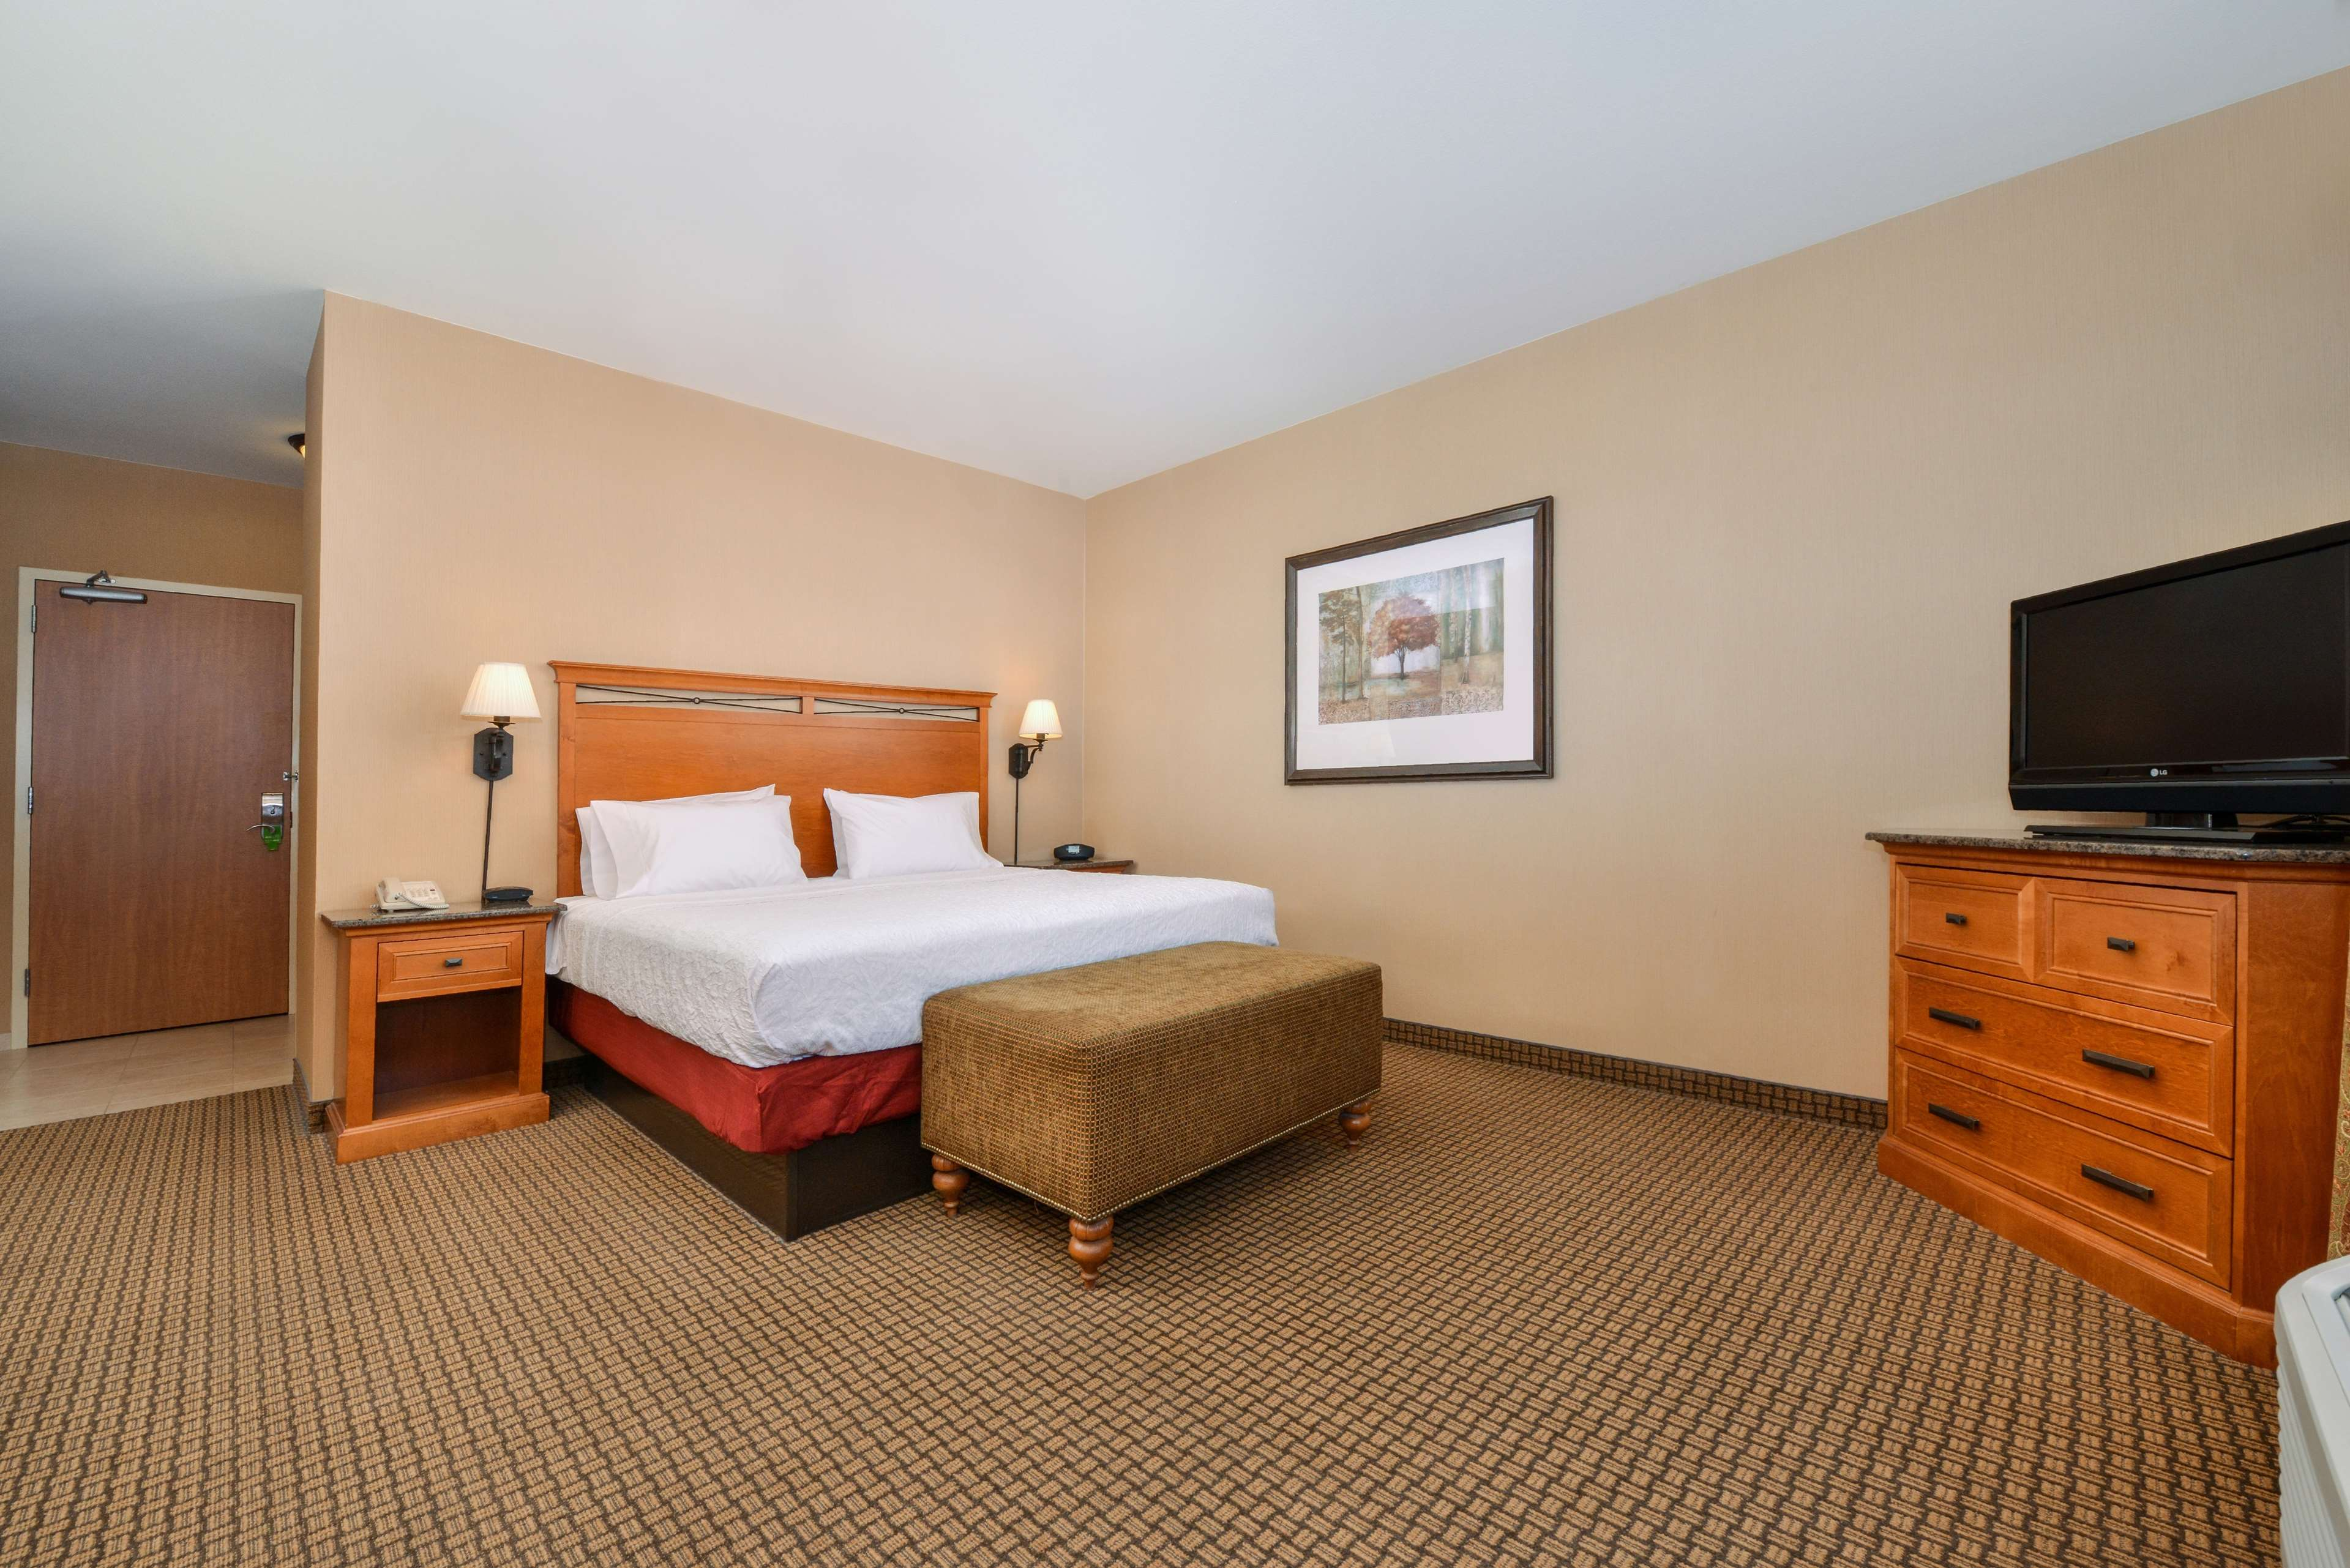 Hampton Inn & Suites Coeur d' Alene image 16